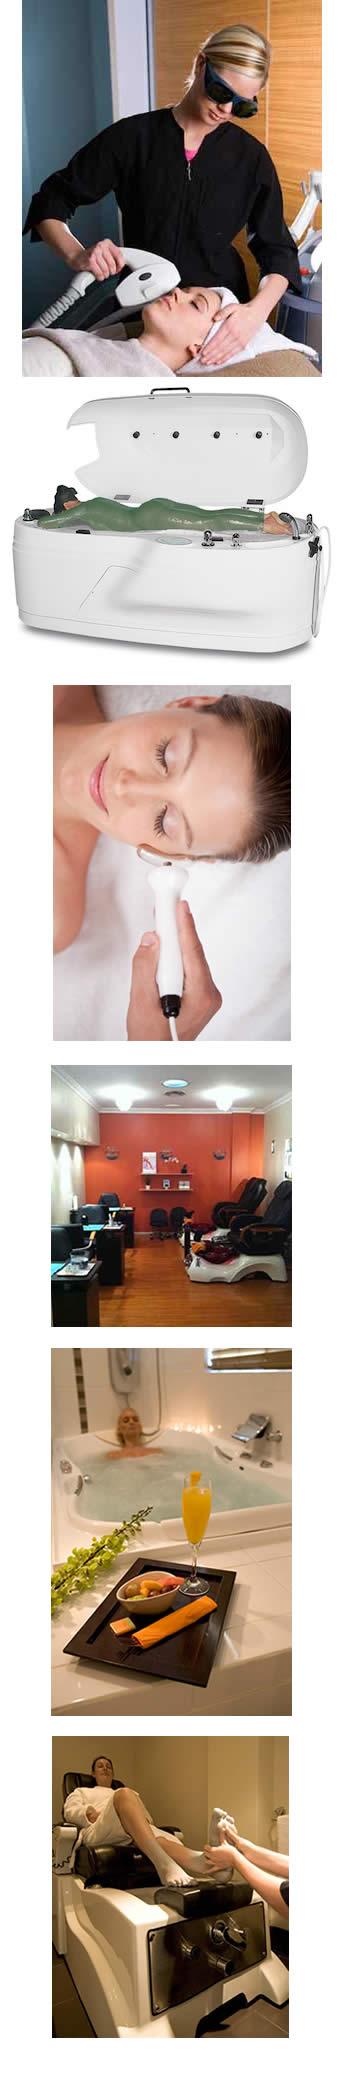 le-beau-medi-spa-equipment-images.jpg